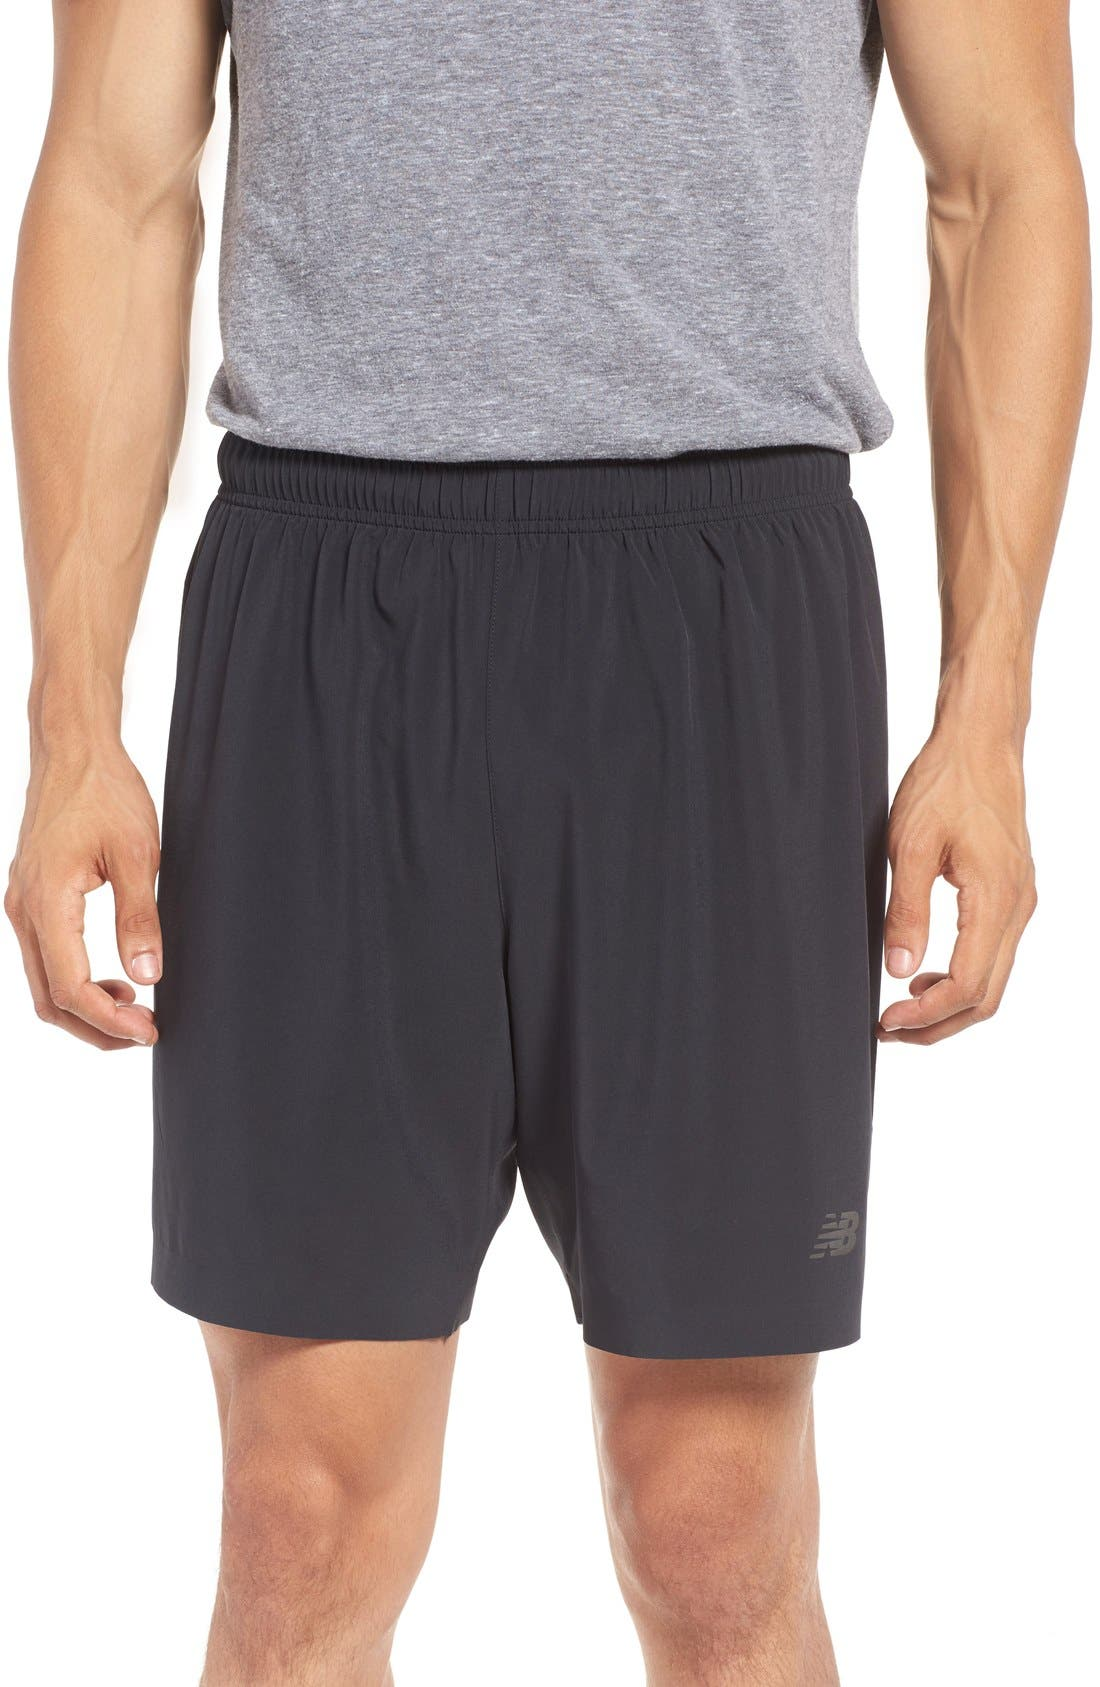 'Shift' Athletic Fit Training Shorts,                         Main,                         color, Black